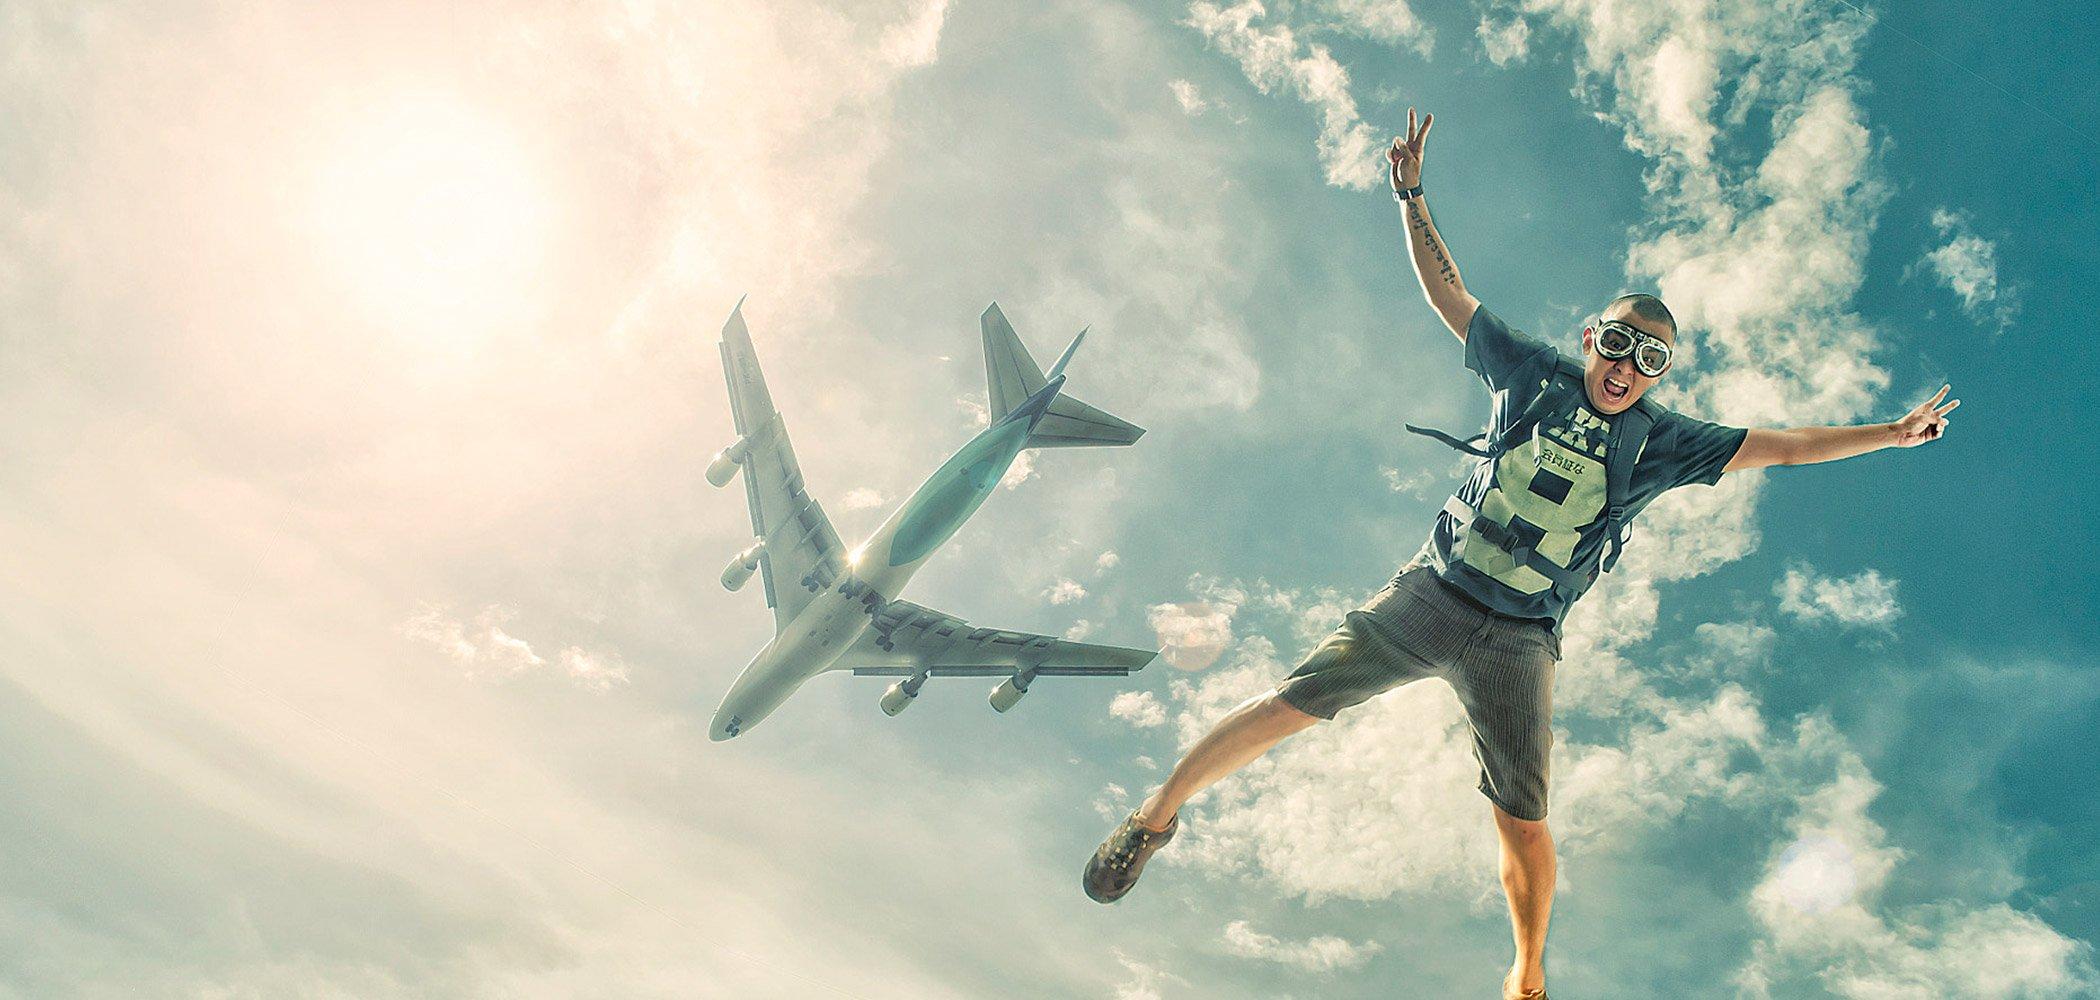 JetBlue's-Airline